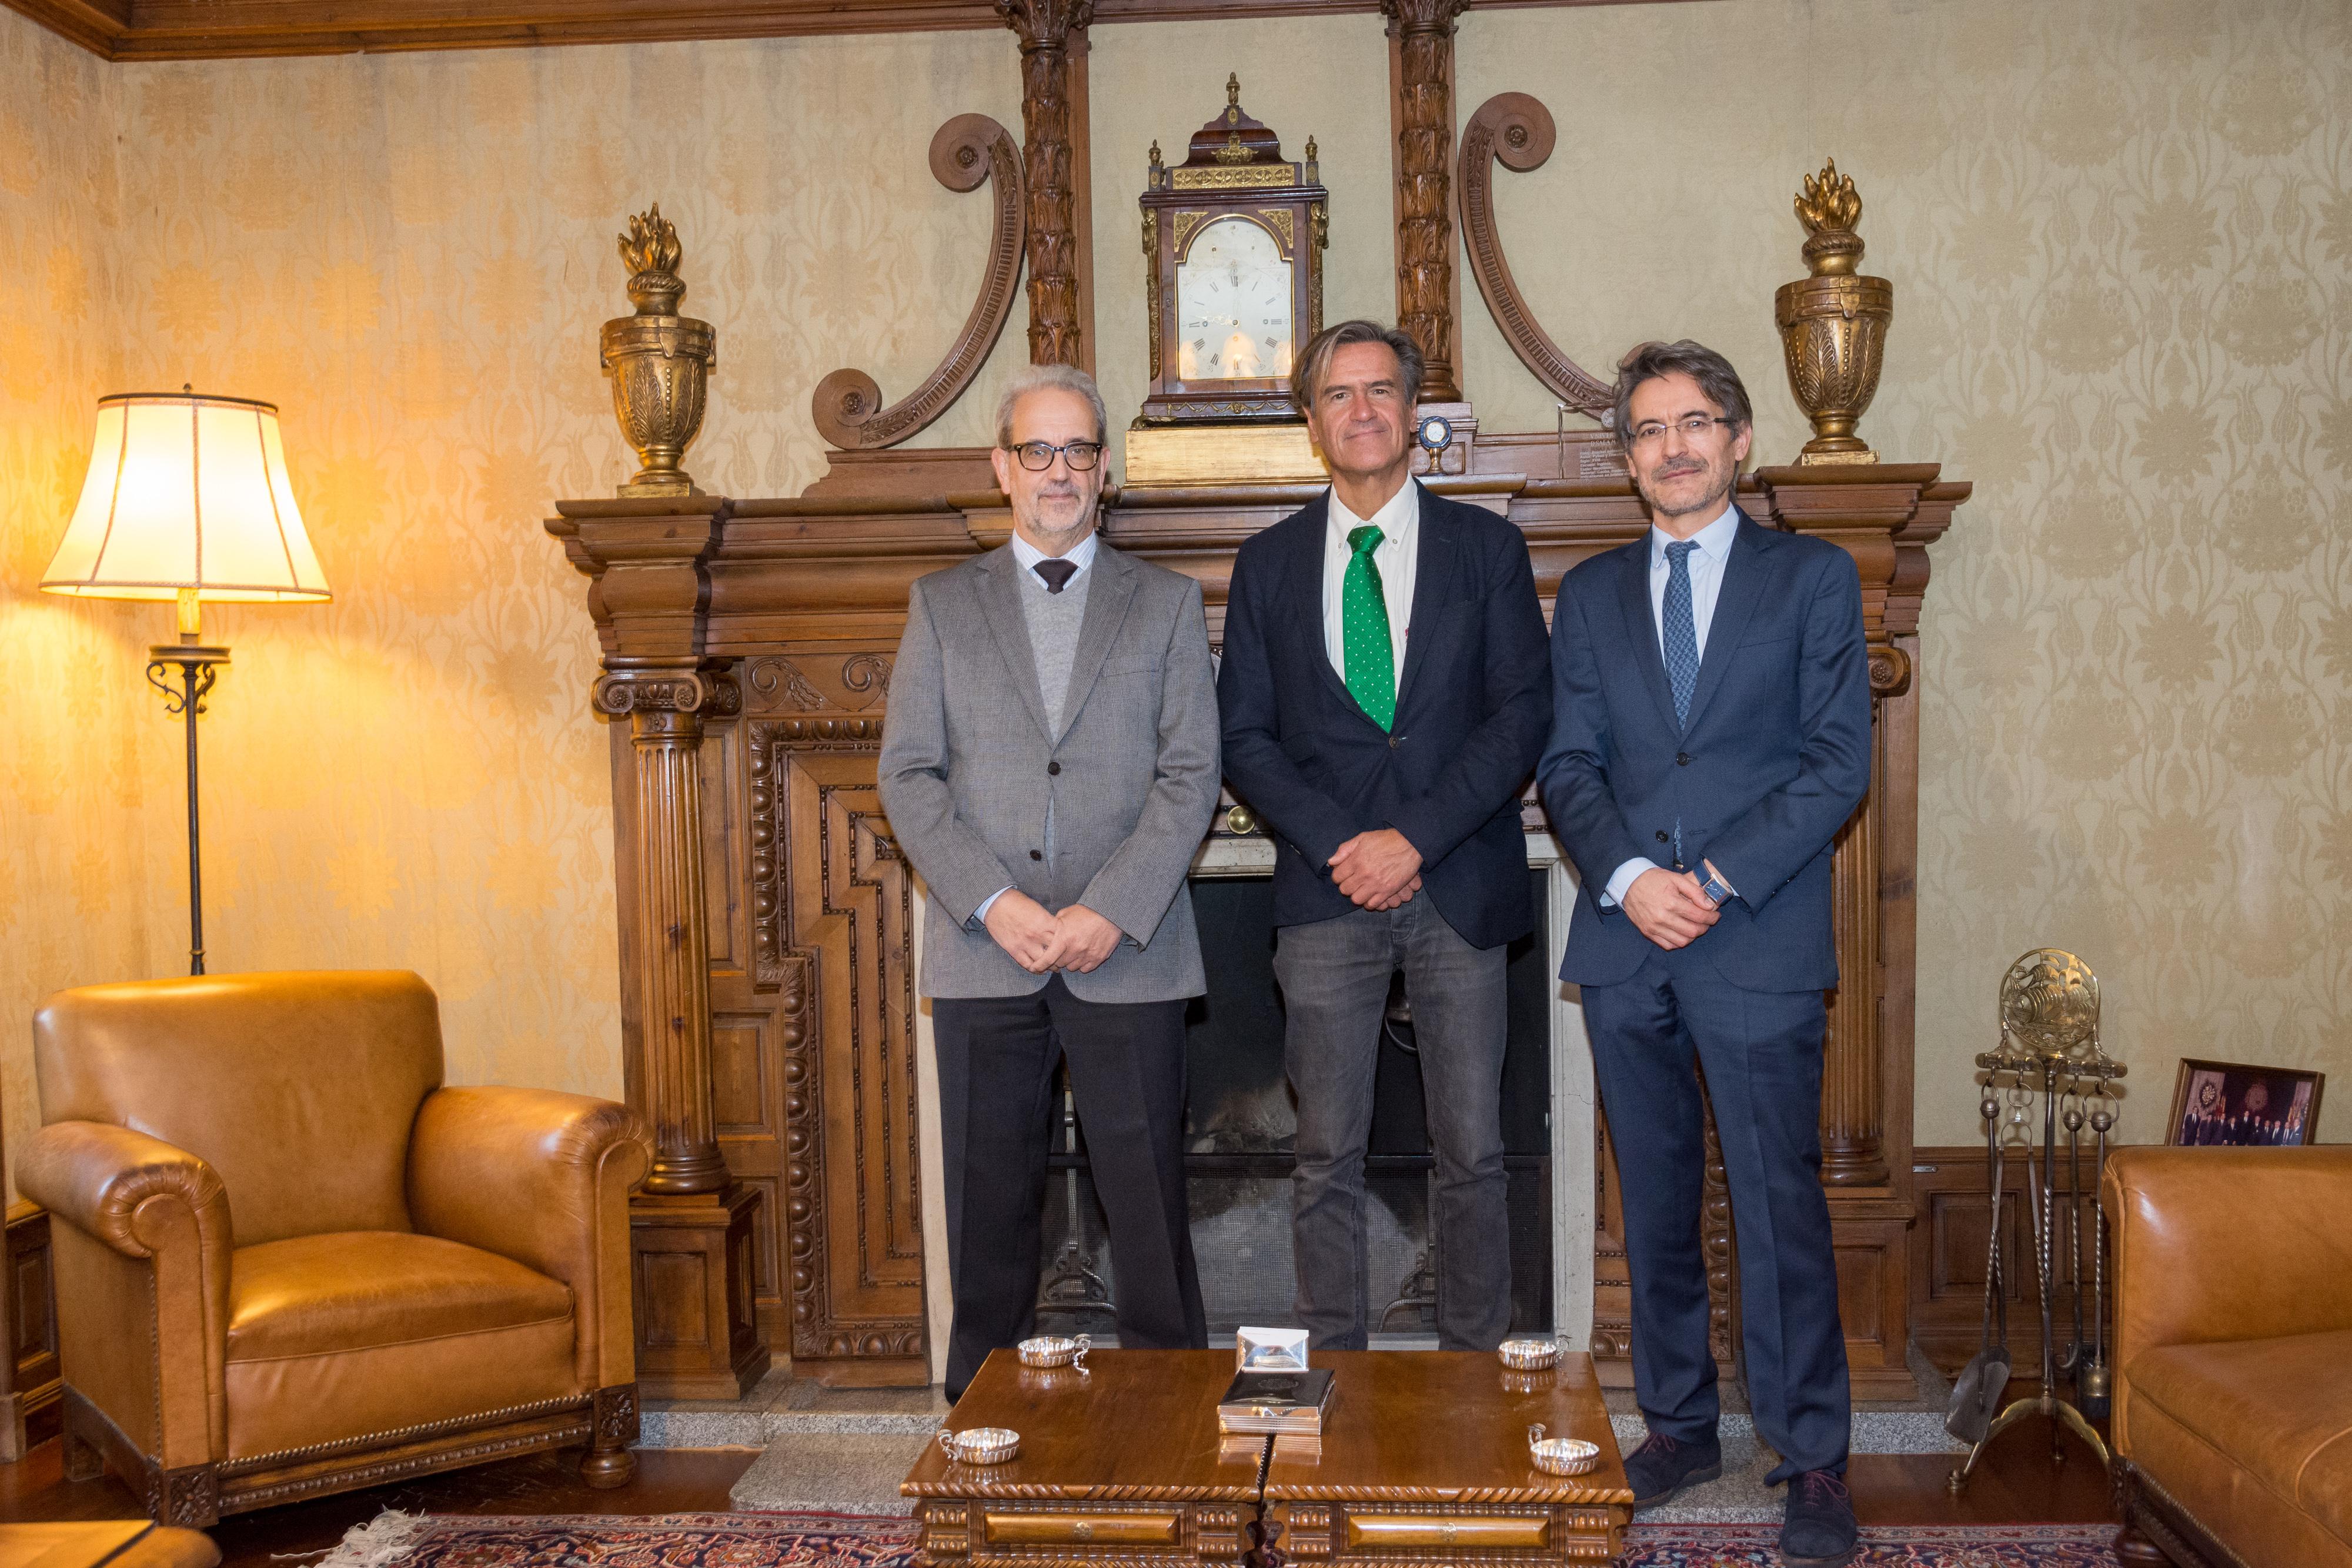 El rector en funciones de la Universidad de Salamanca recibe al eurodiputado Juan Fernando López Aguilar